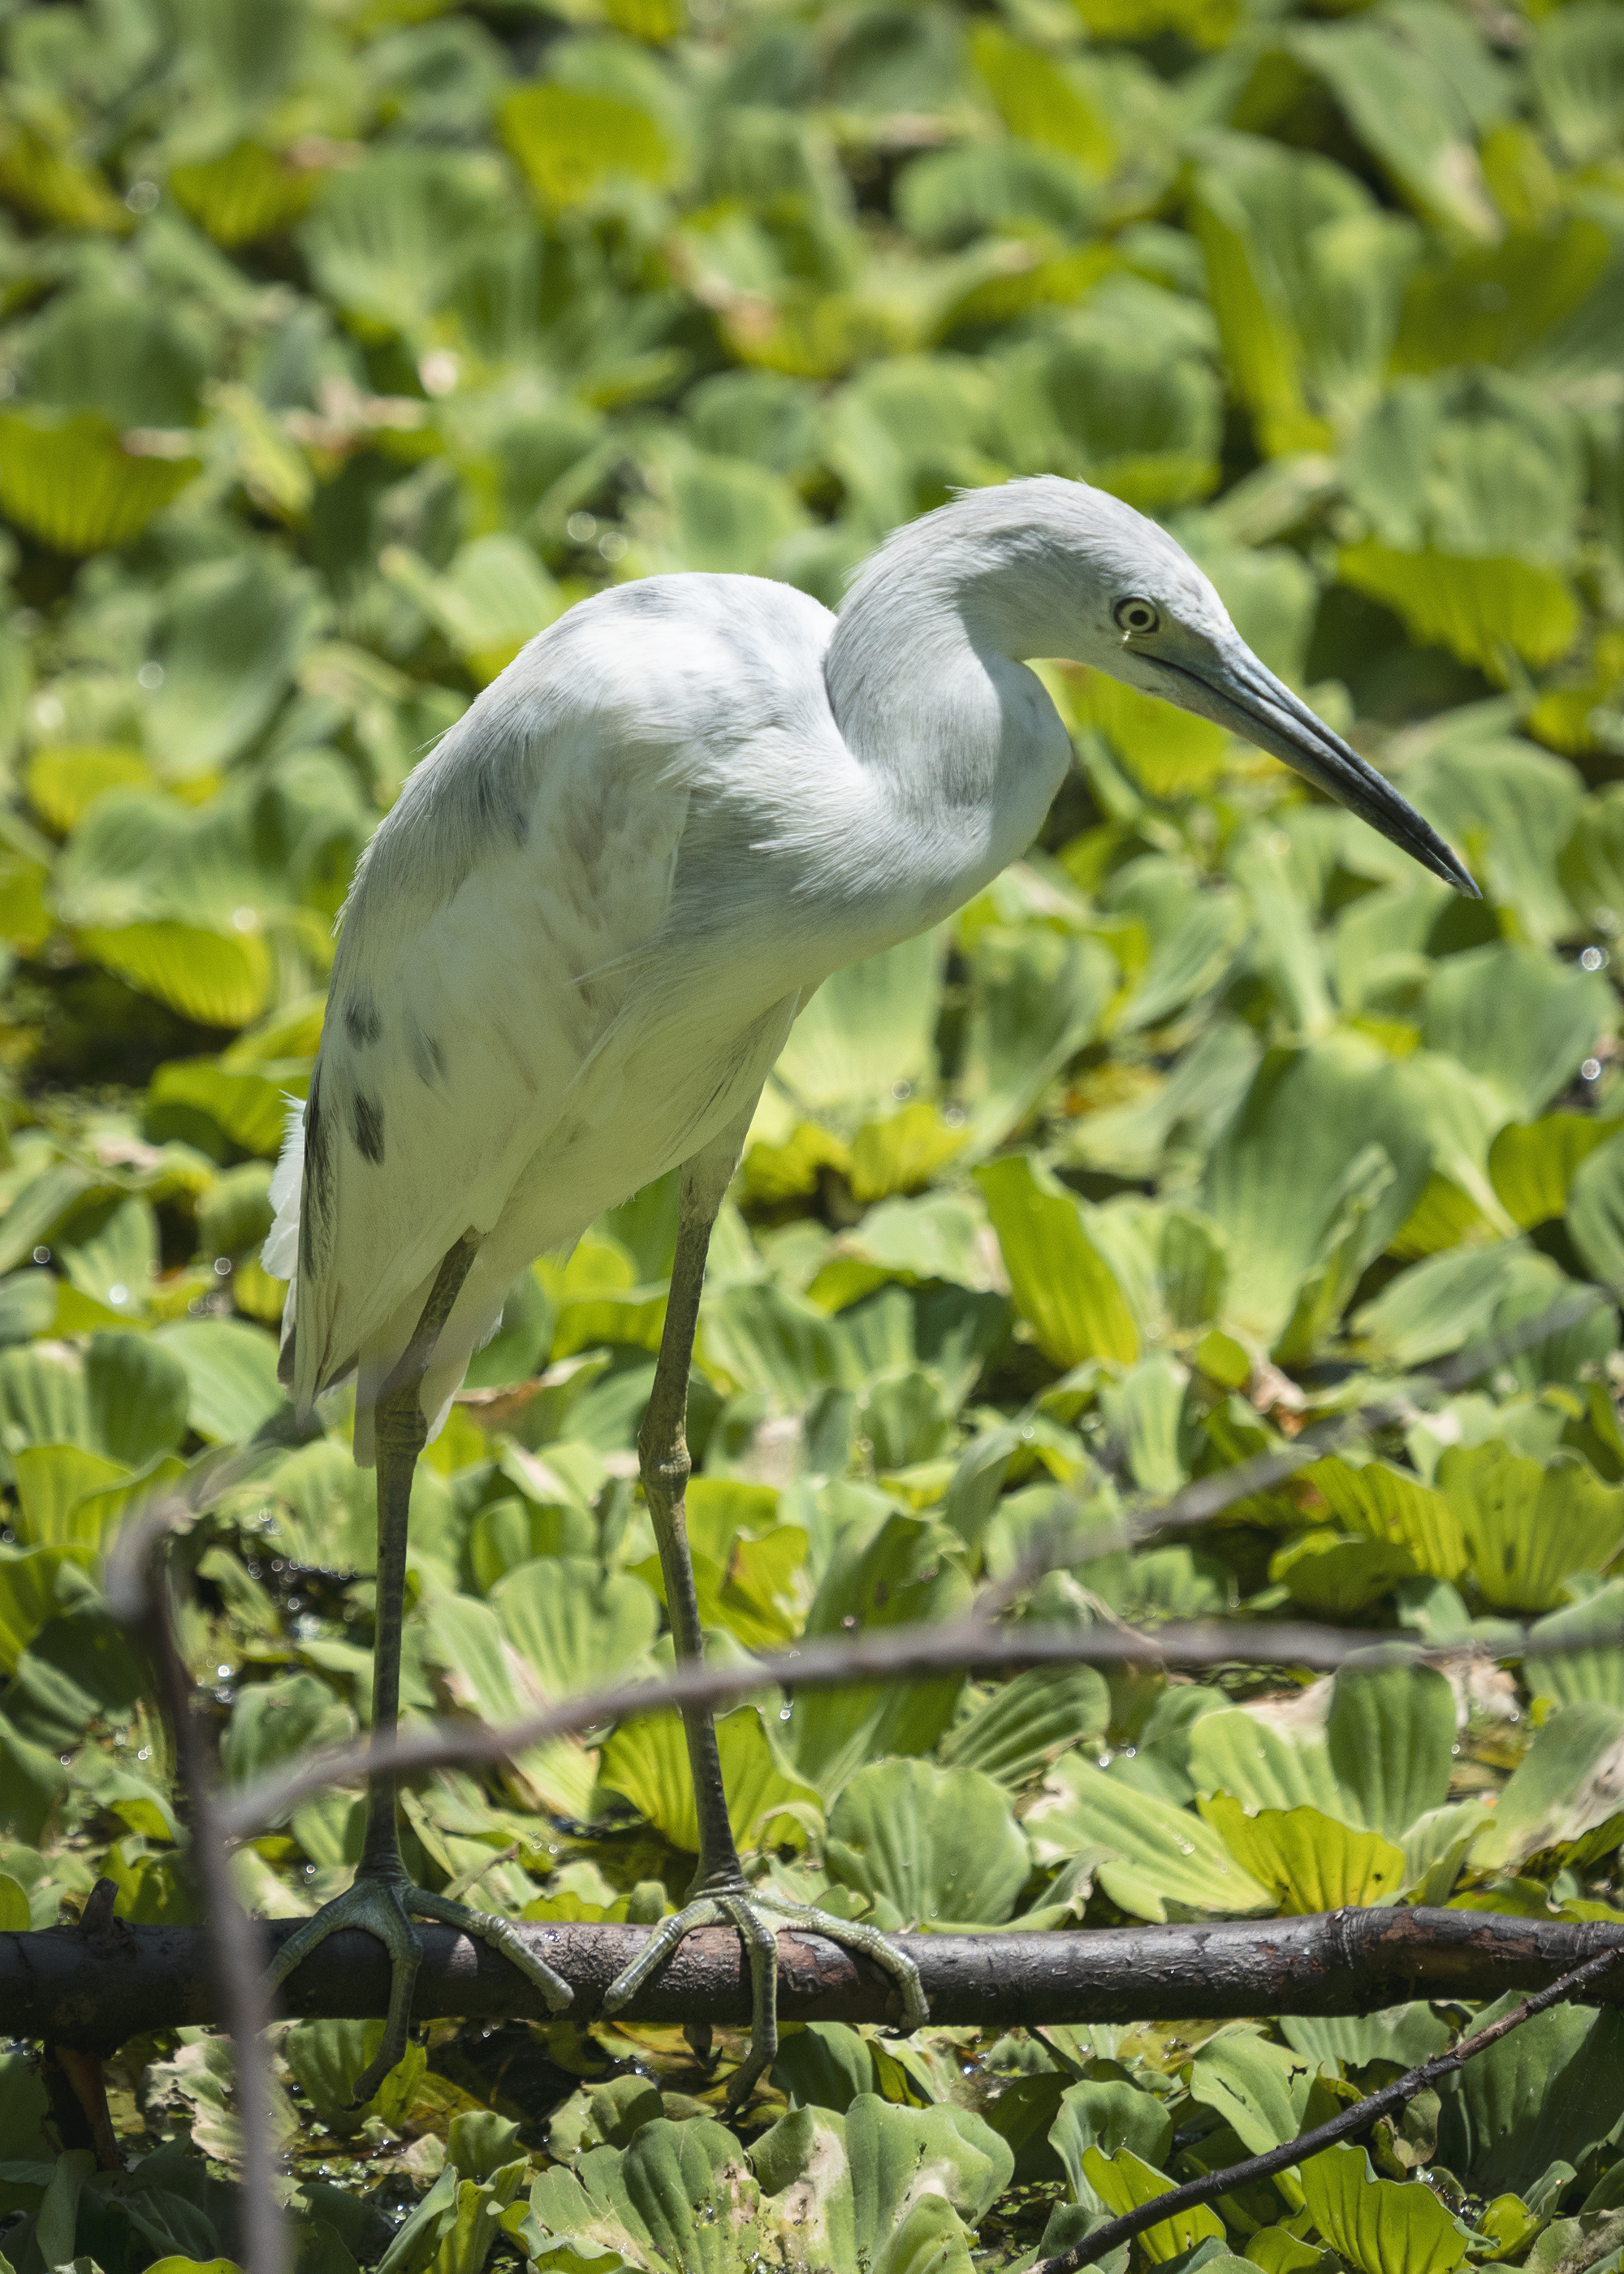 #heron, #blueheron, #corkscrew, #florida, #naples, #corkscrewswampsanctuary, #juvenile, #whoami, #birdphotography